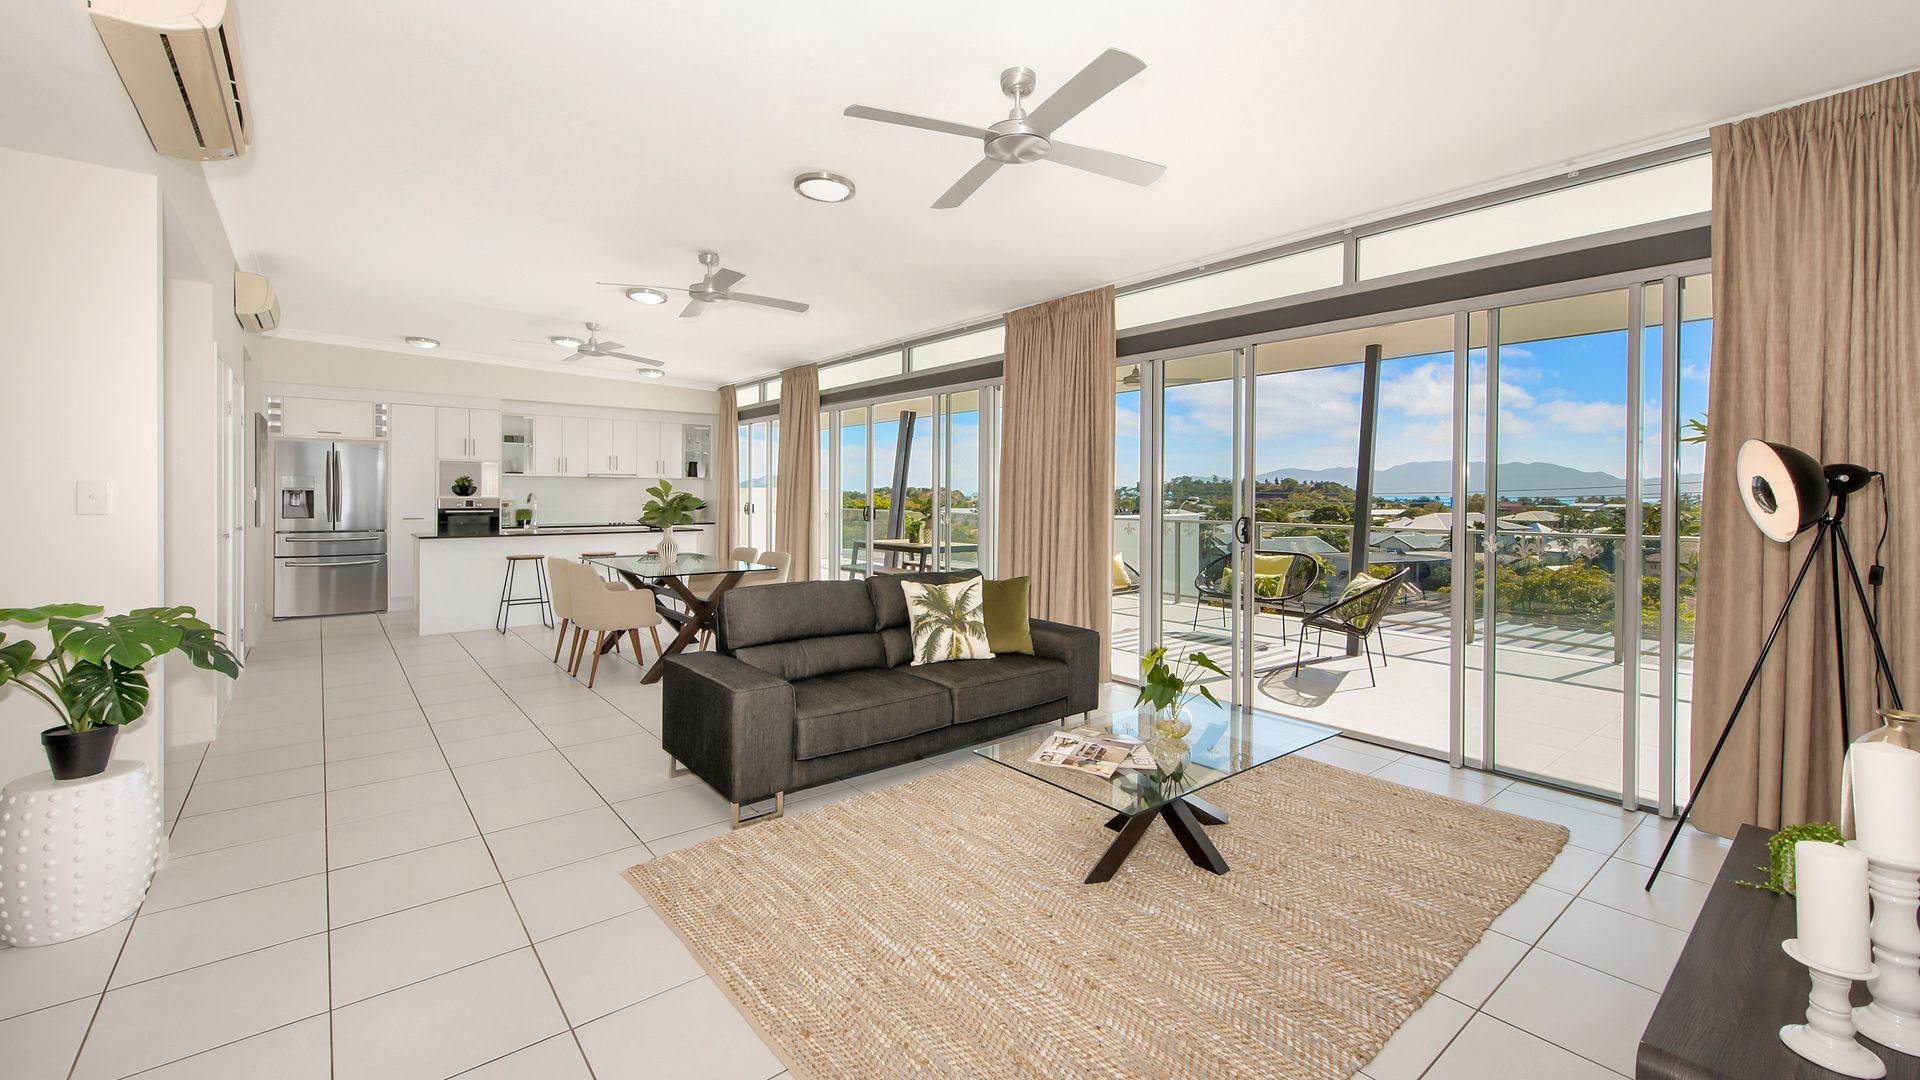 15/28 Landsborough Street, North Ward QLD 4810, Image 1